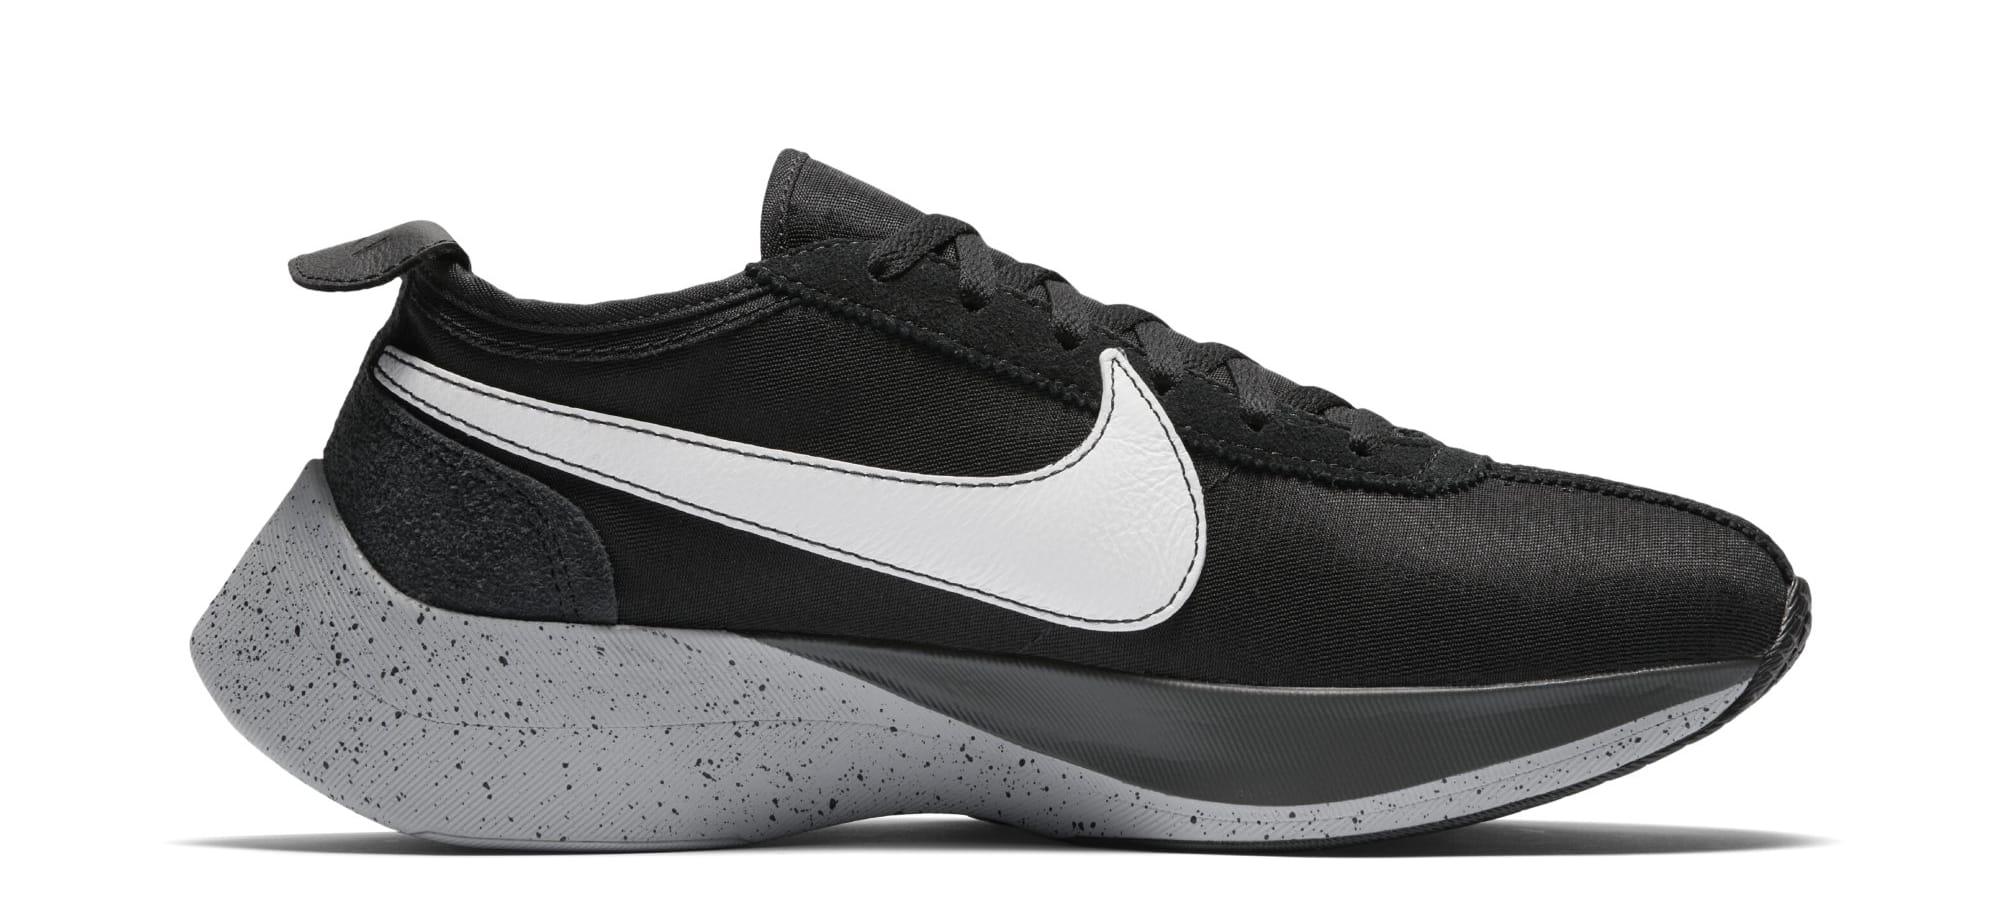 Nike Moon Racer 'Black/White/Wolf Grey' AQ4121-001 (Medial)